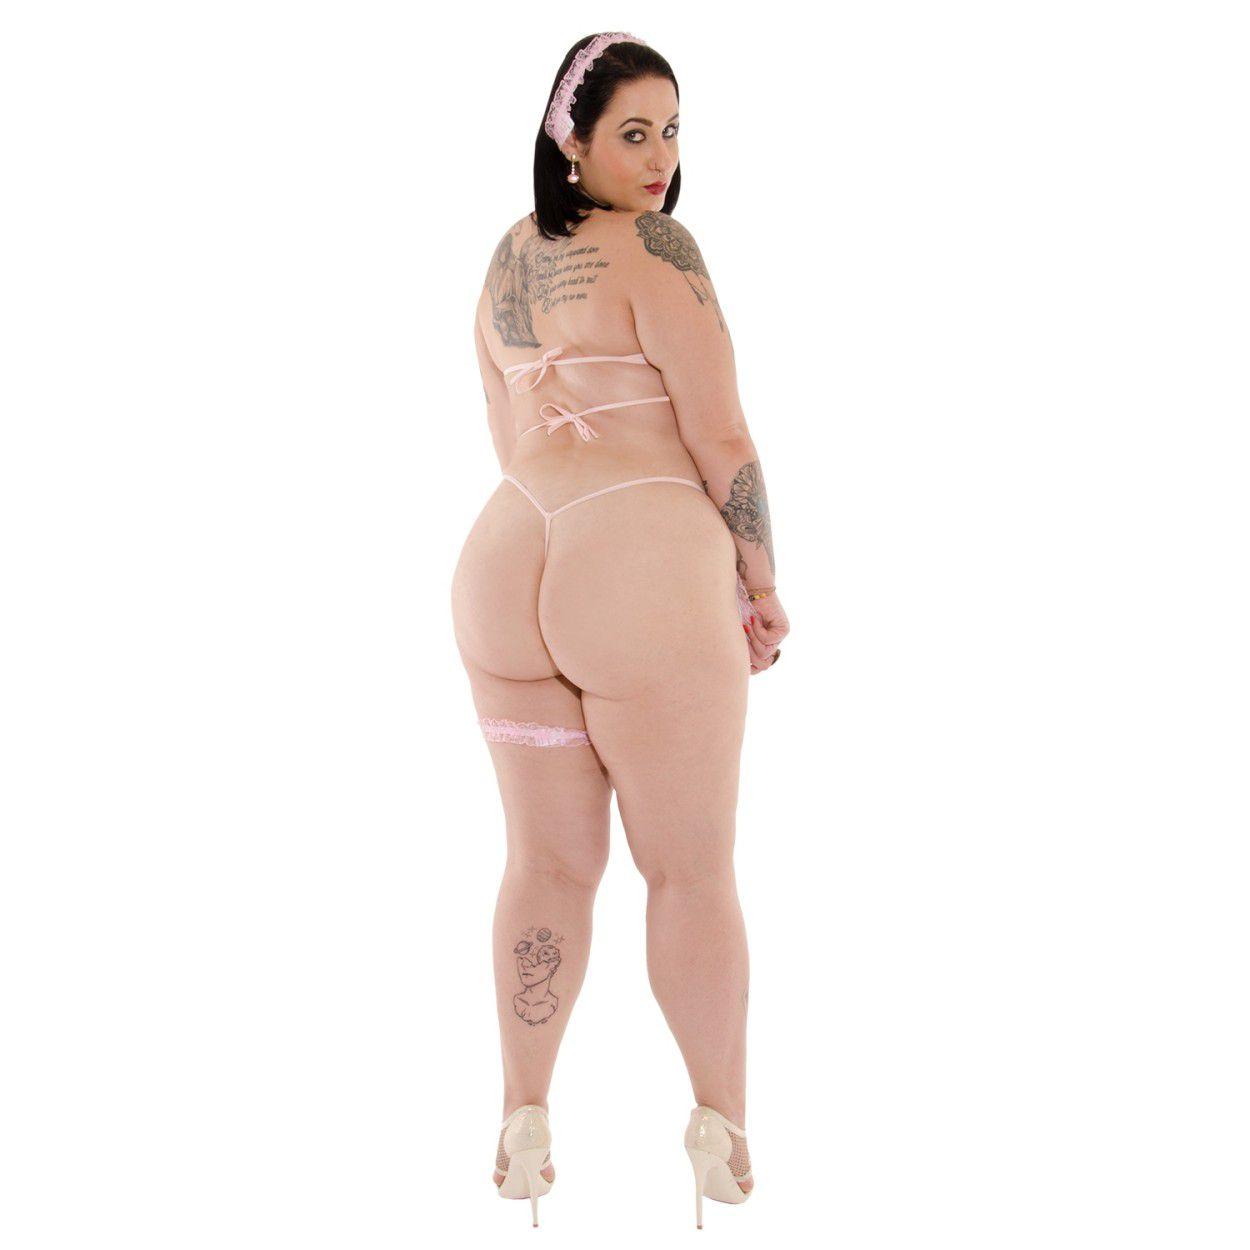 Fantasia Babá Ludmila Plus Size (Manequins 44 ao 50)